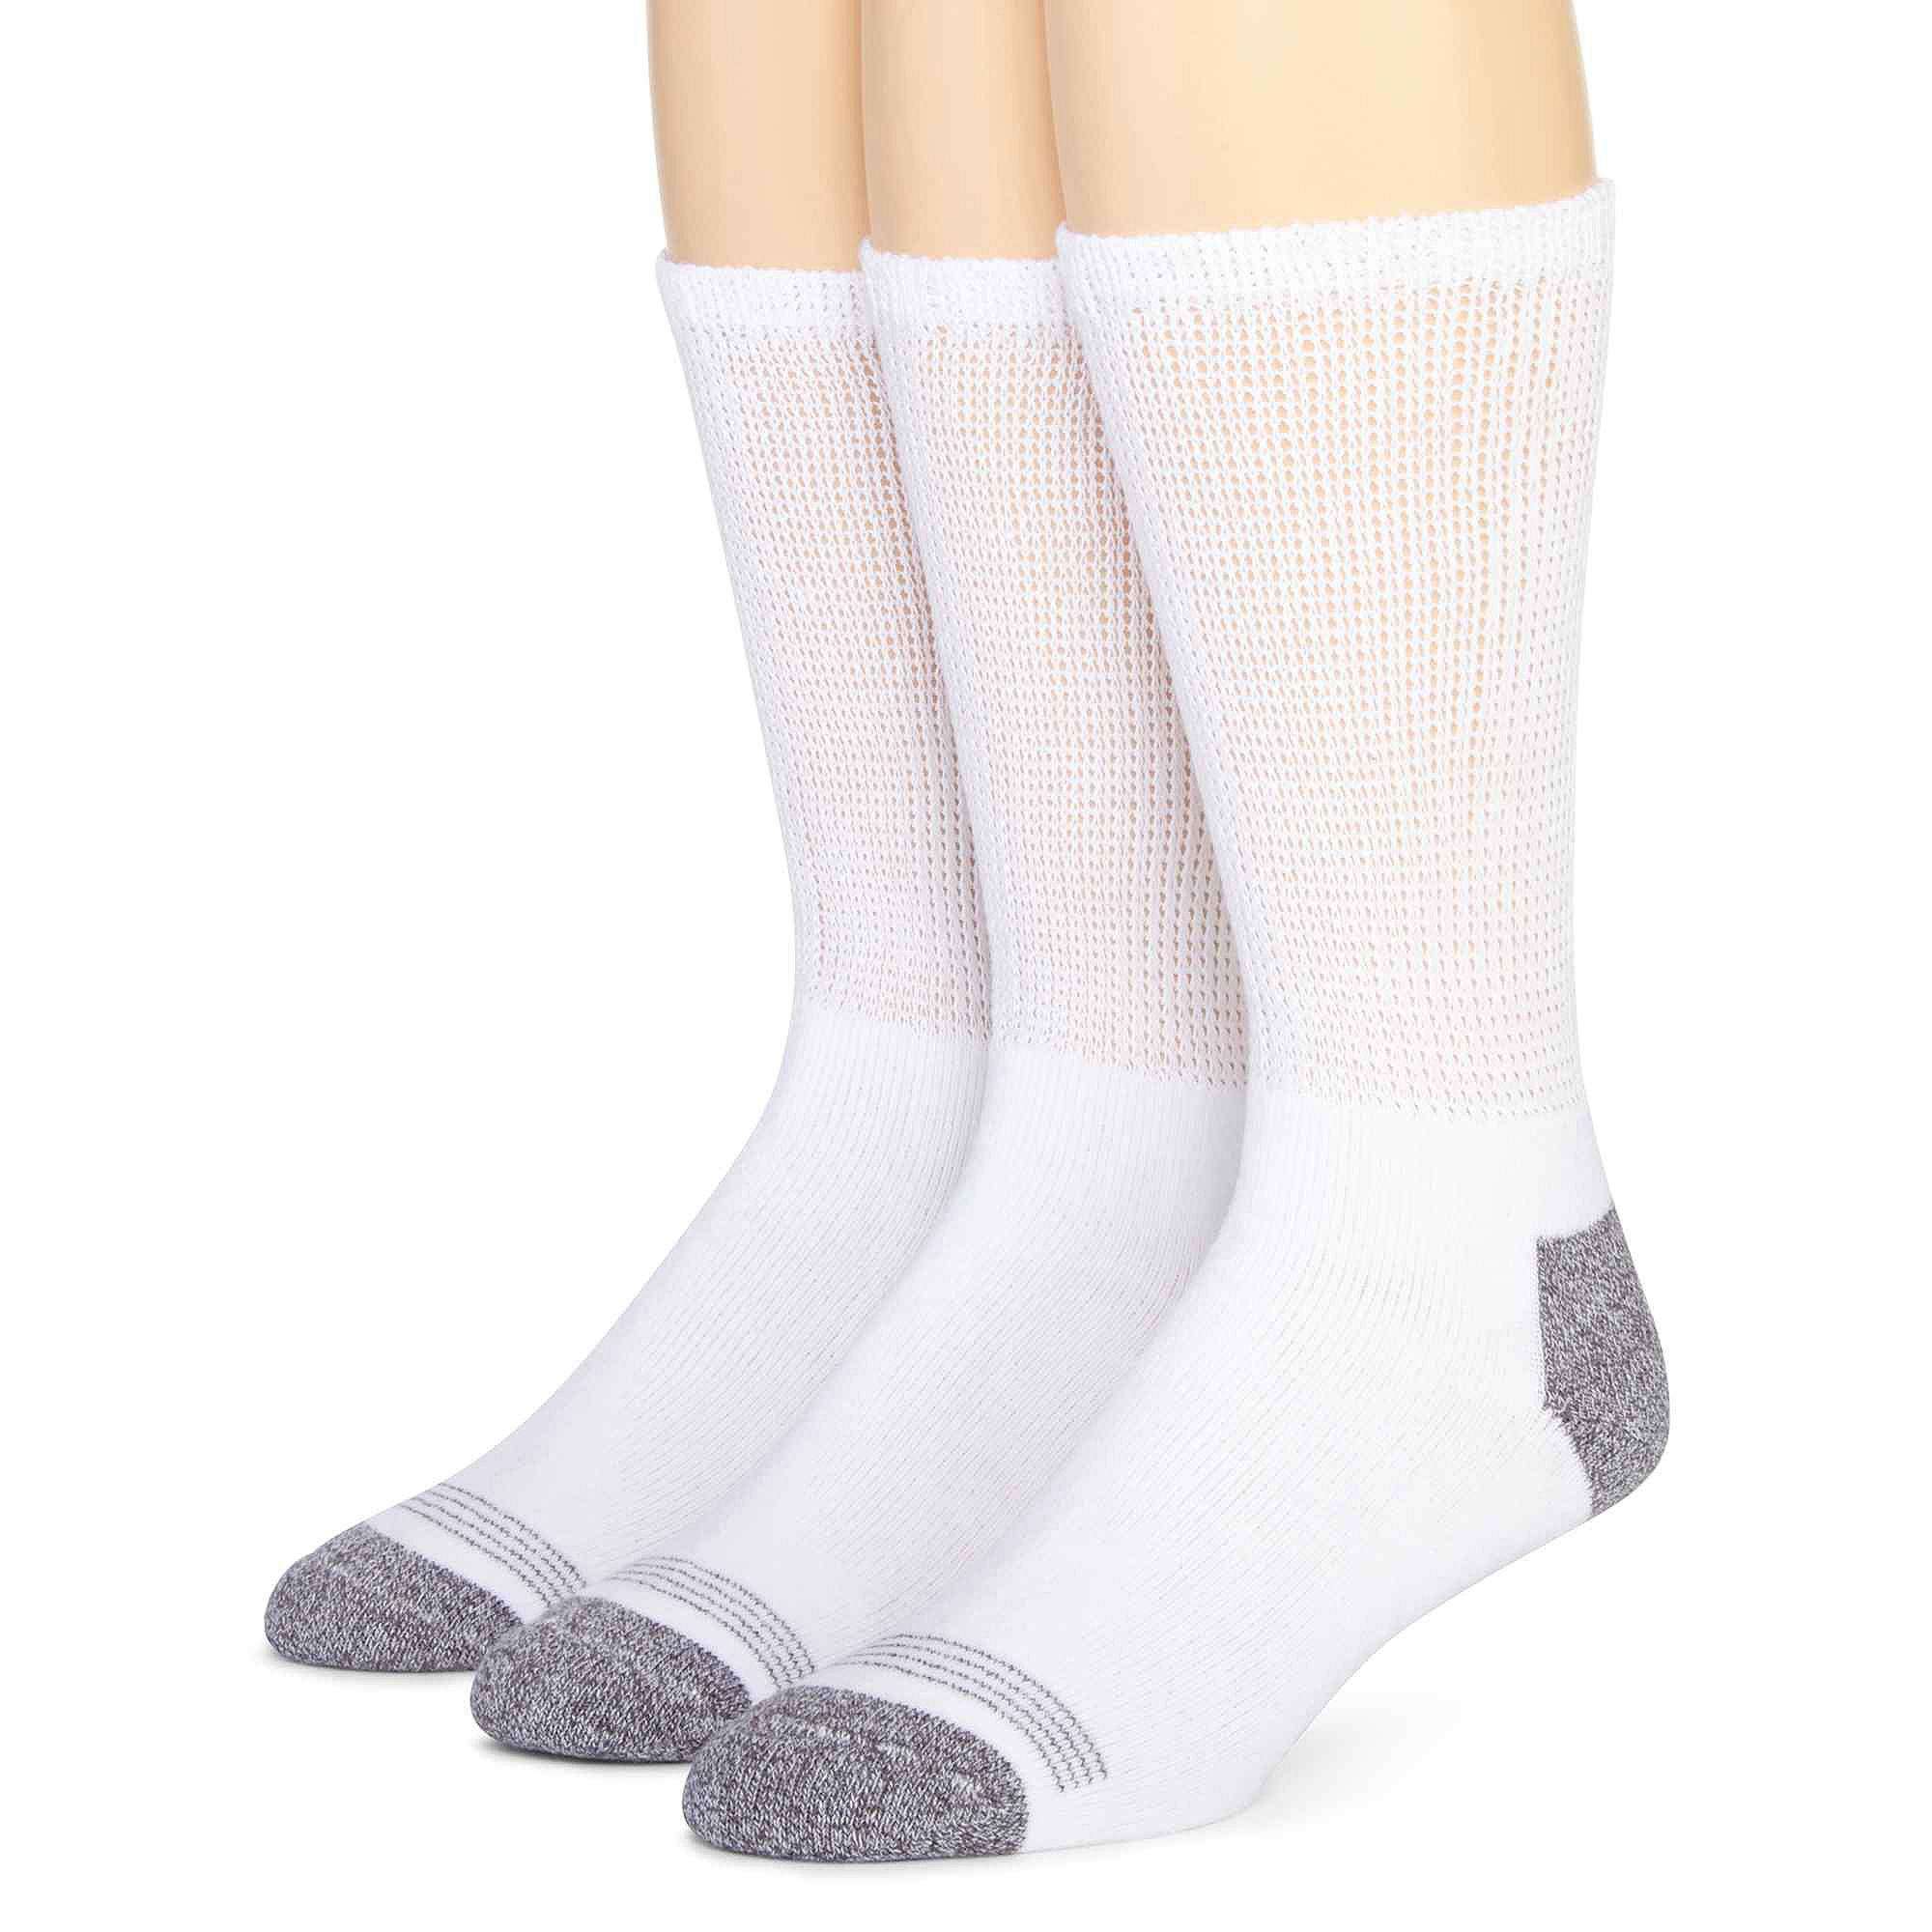 Dockers 3-pk. Non-Binding Socks-Big & Tall